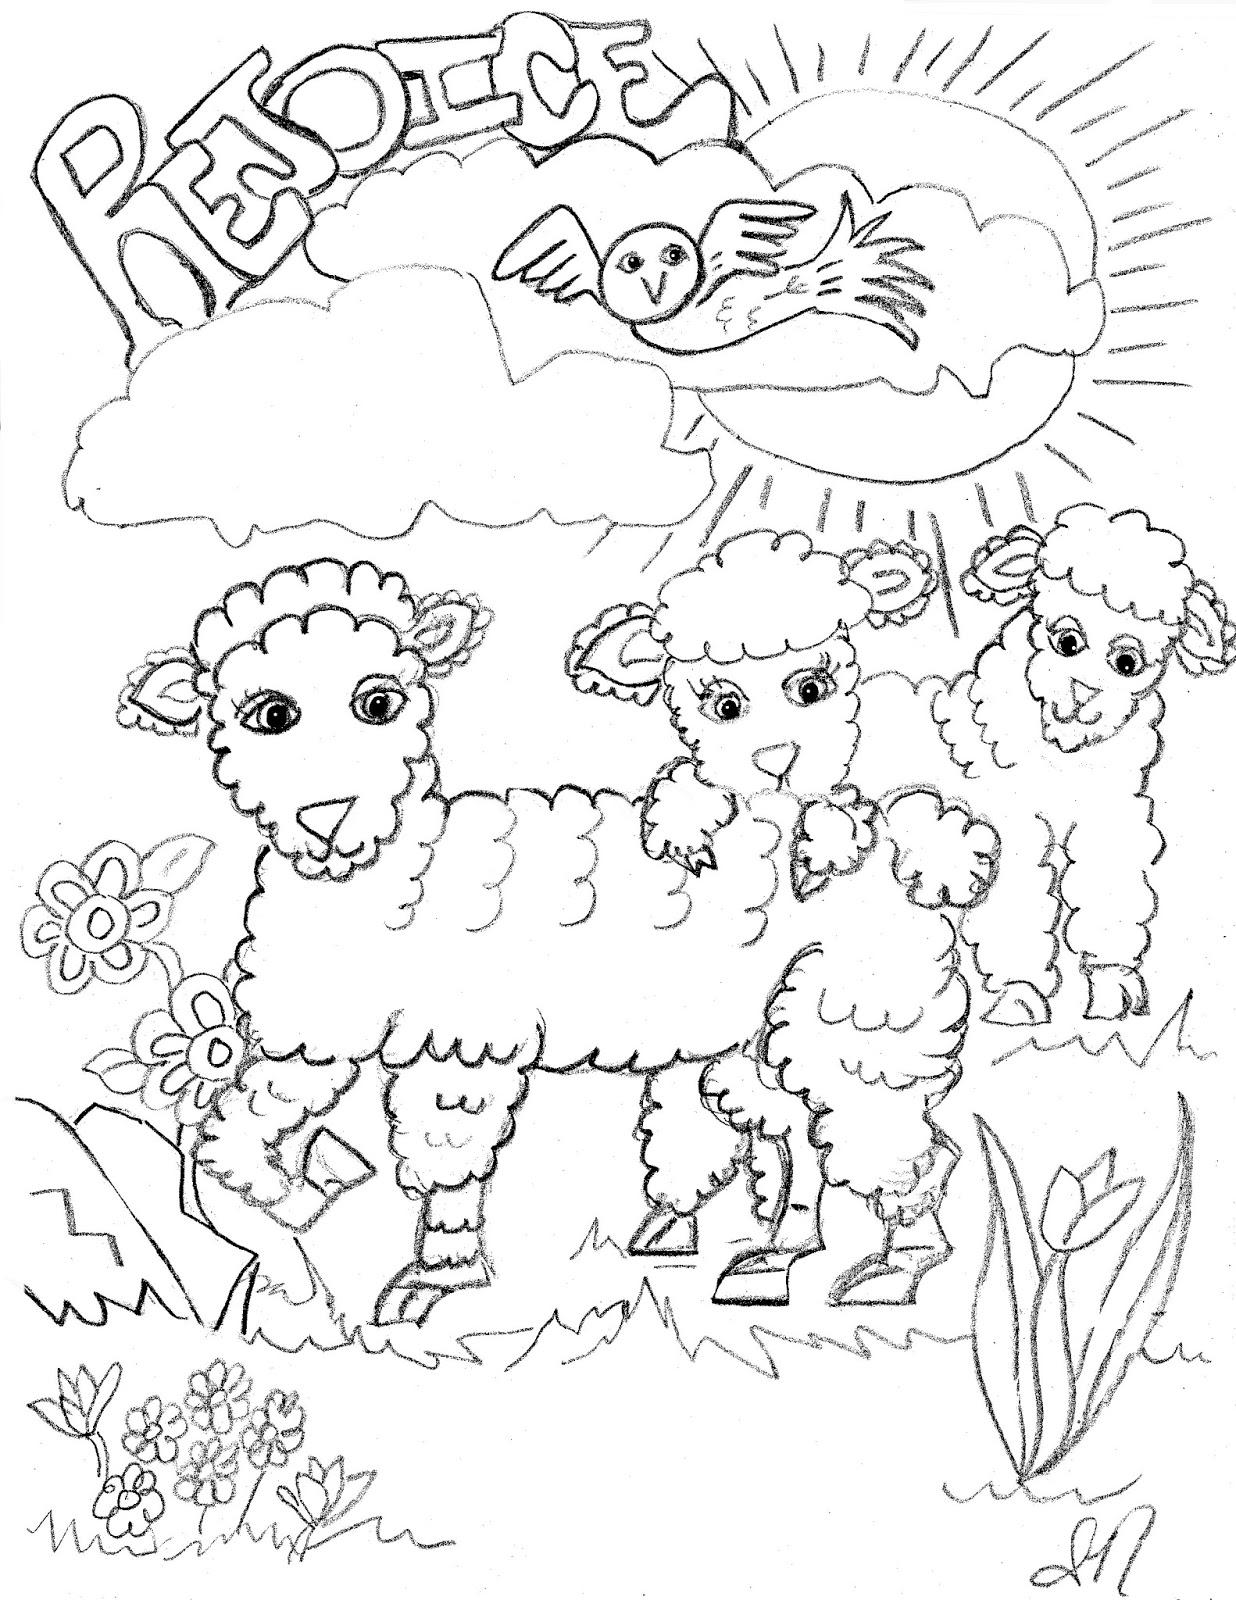 treasure box drawing for jesus lambs rejoice coloring page